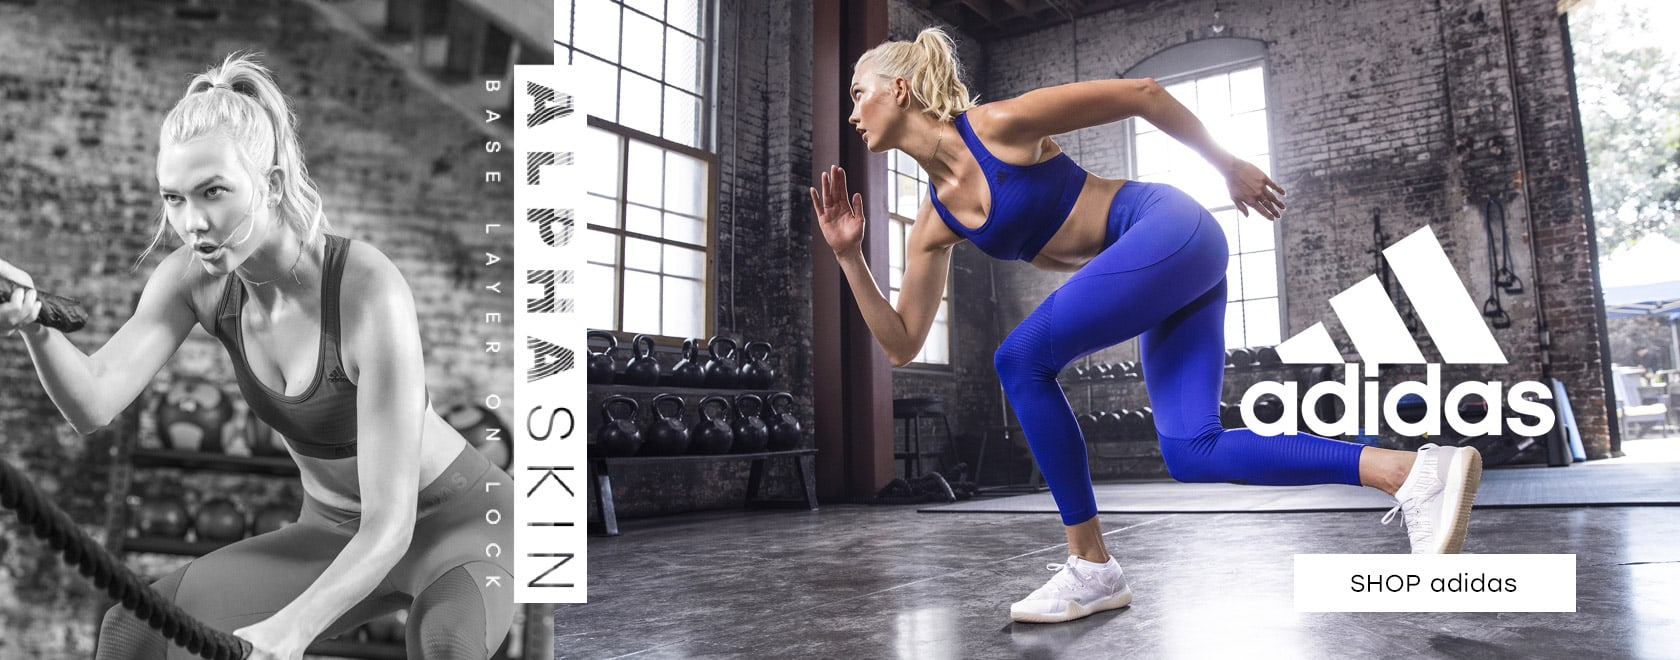 Women S Sportswear Nike Adidas And Ellesse Jd Sports